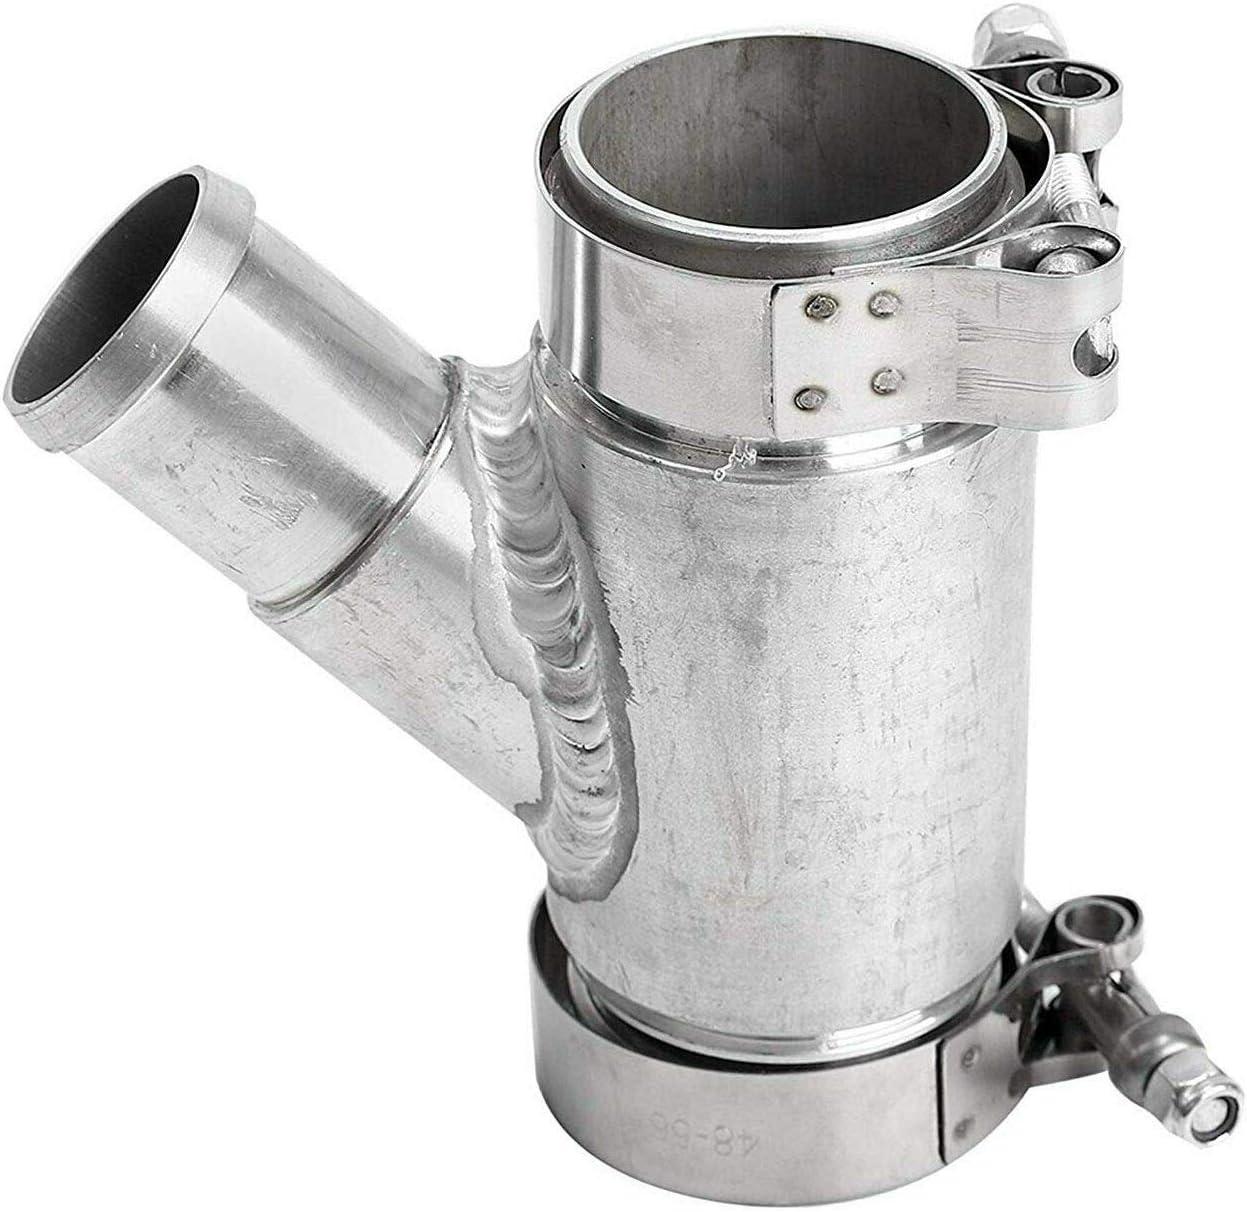 Fekuar Aluminum Dual Radiator Coolant Y-Pipe Billet Diesel Parts for 2013 2014 Dodge Ram Cummins 6.7L-Billet